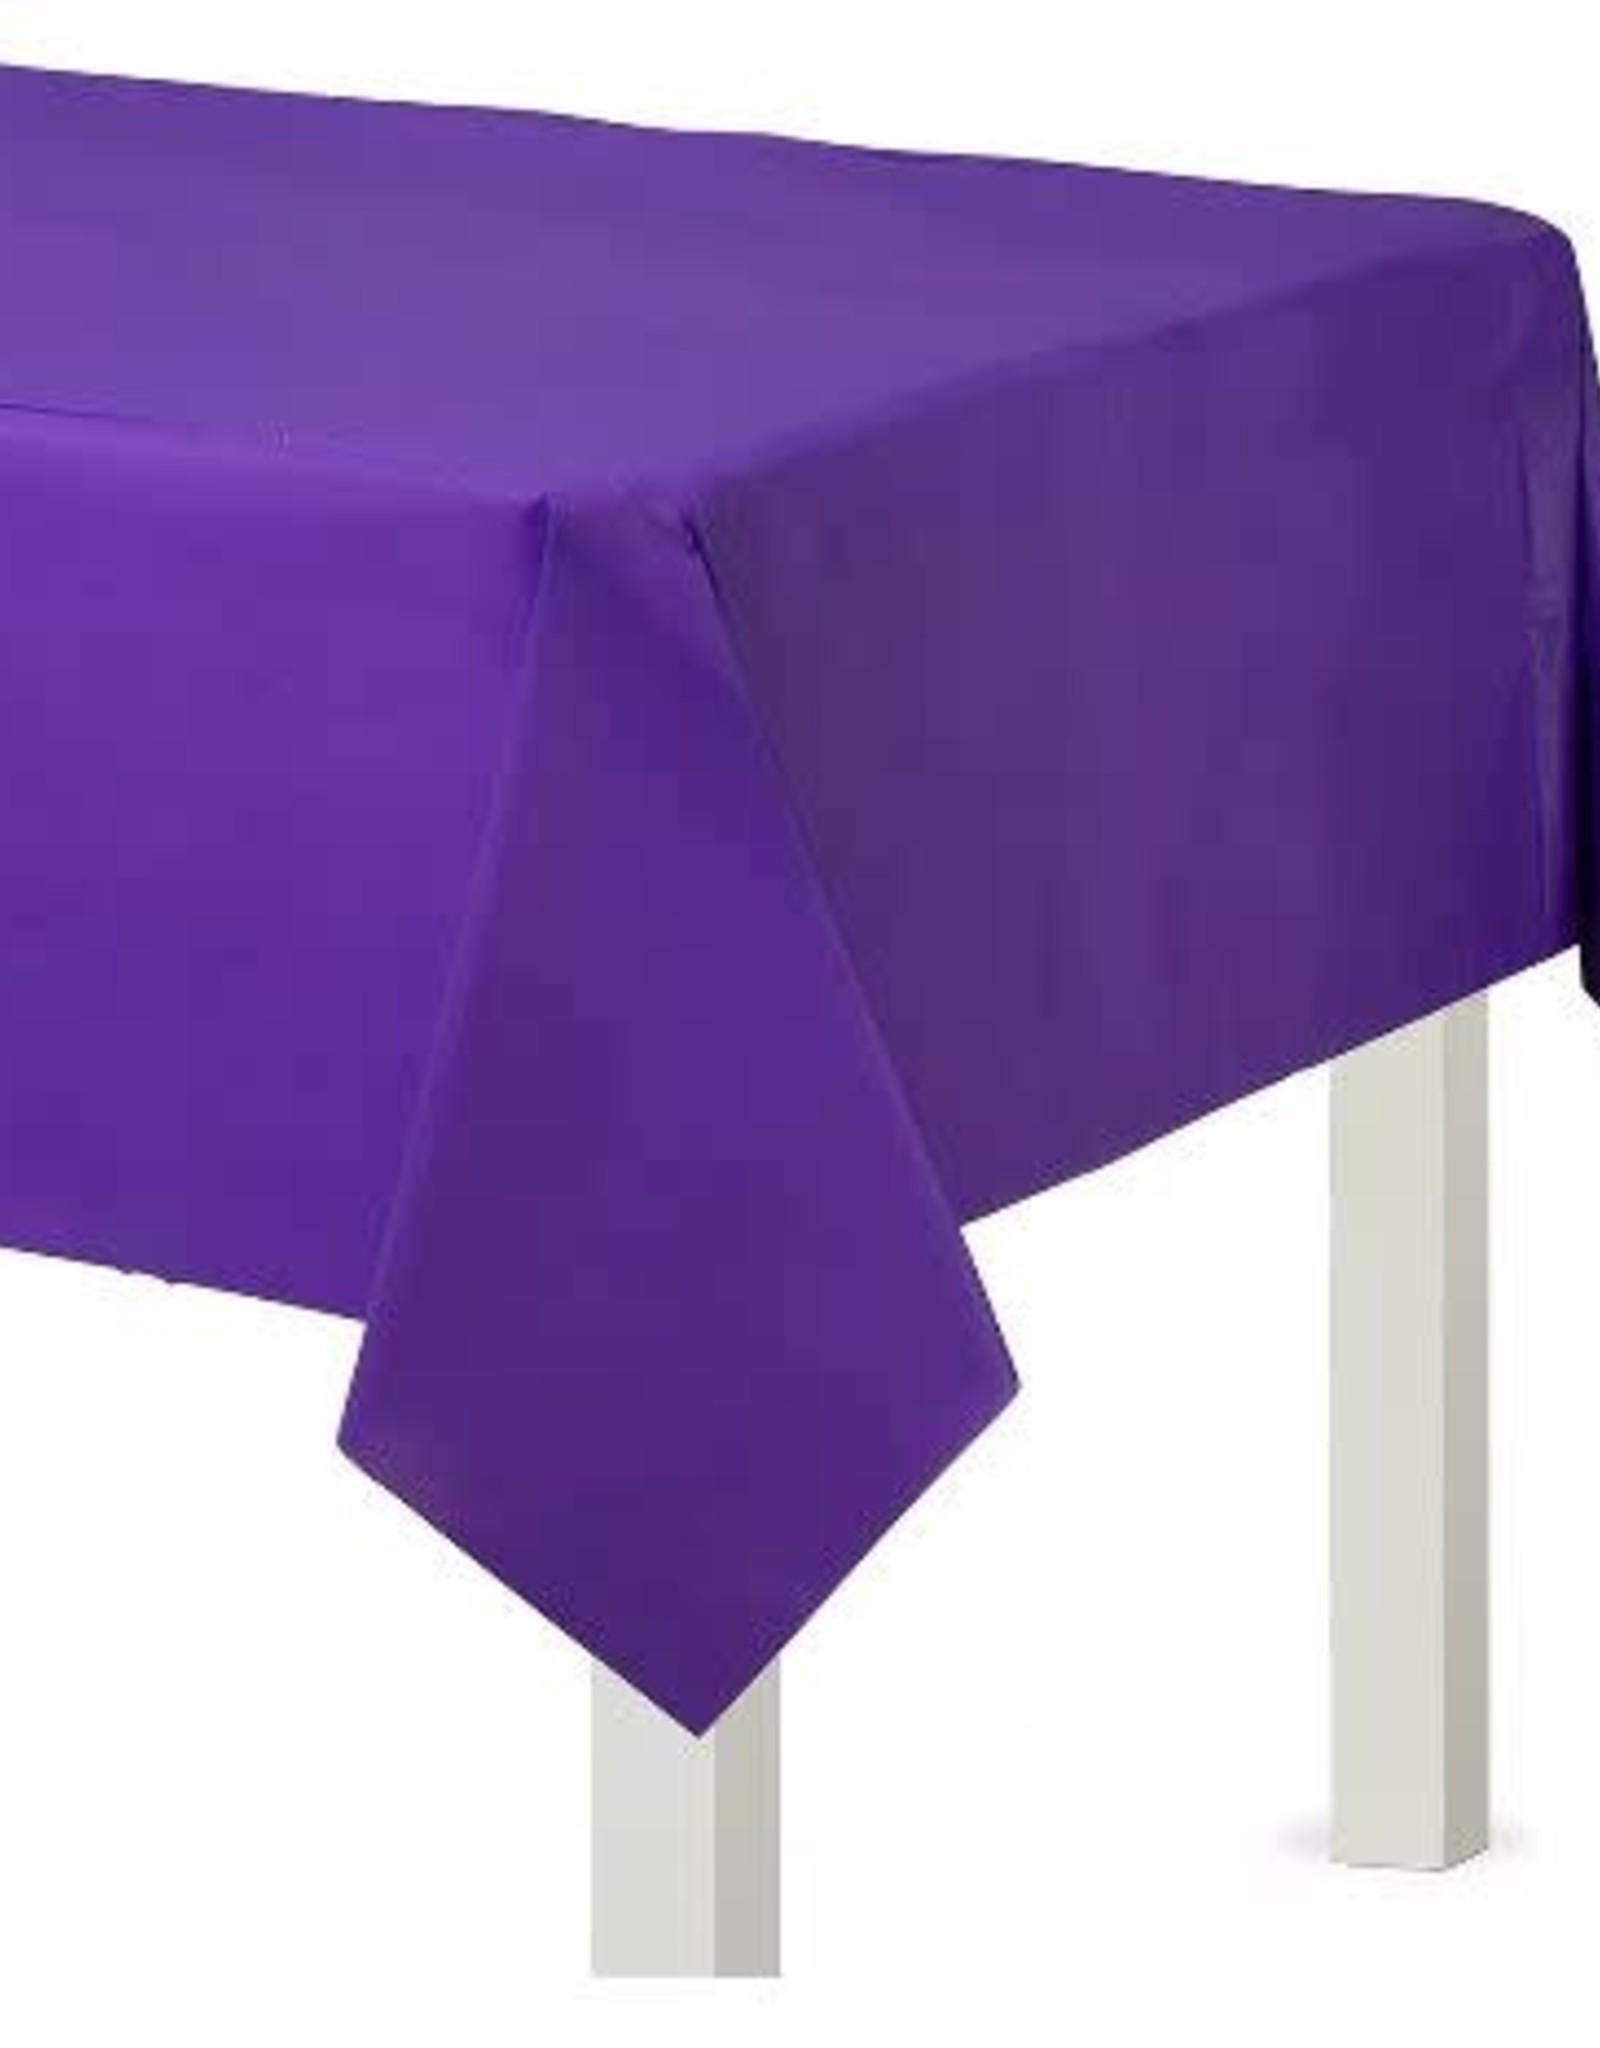 Plastic New Purple Tablecloth 54 x 108 Rectangle